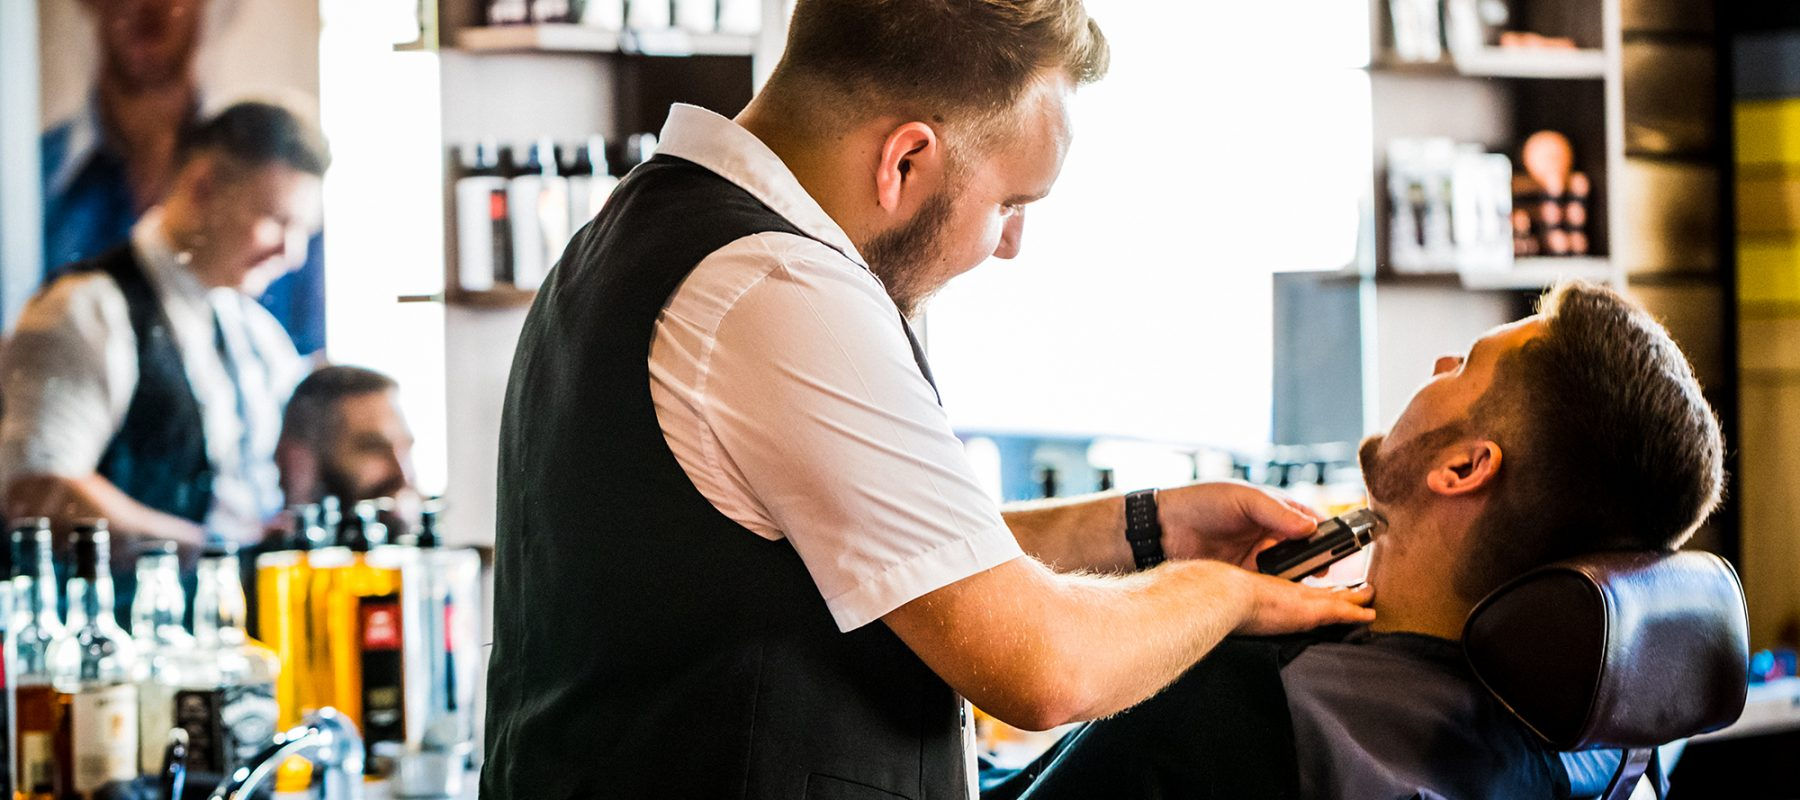 Maxime-homme-page-accueil-barbier-coiffeur--orfevres44